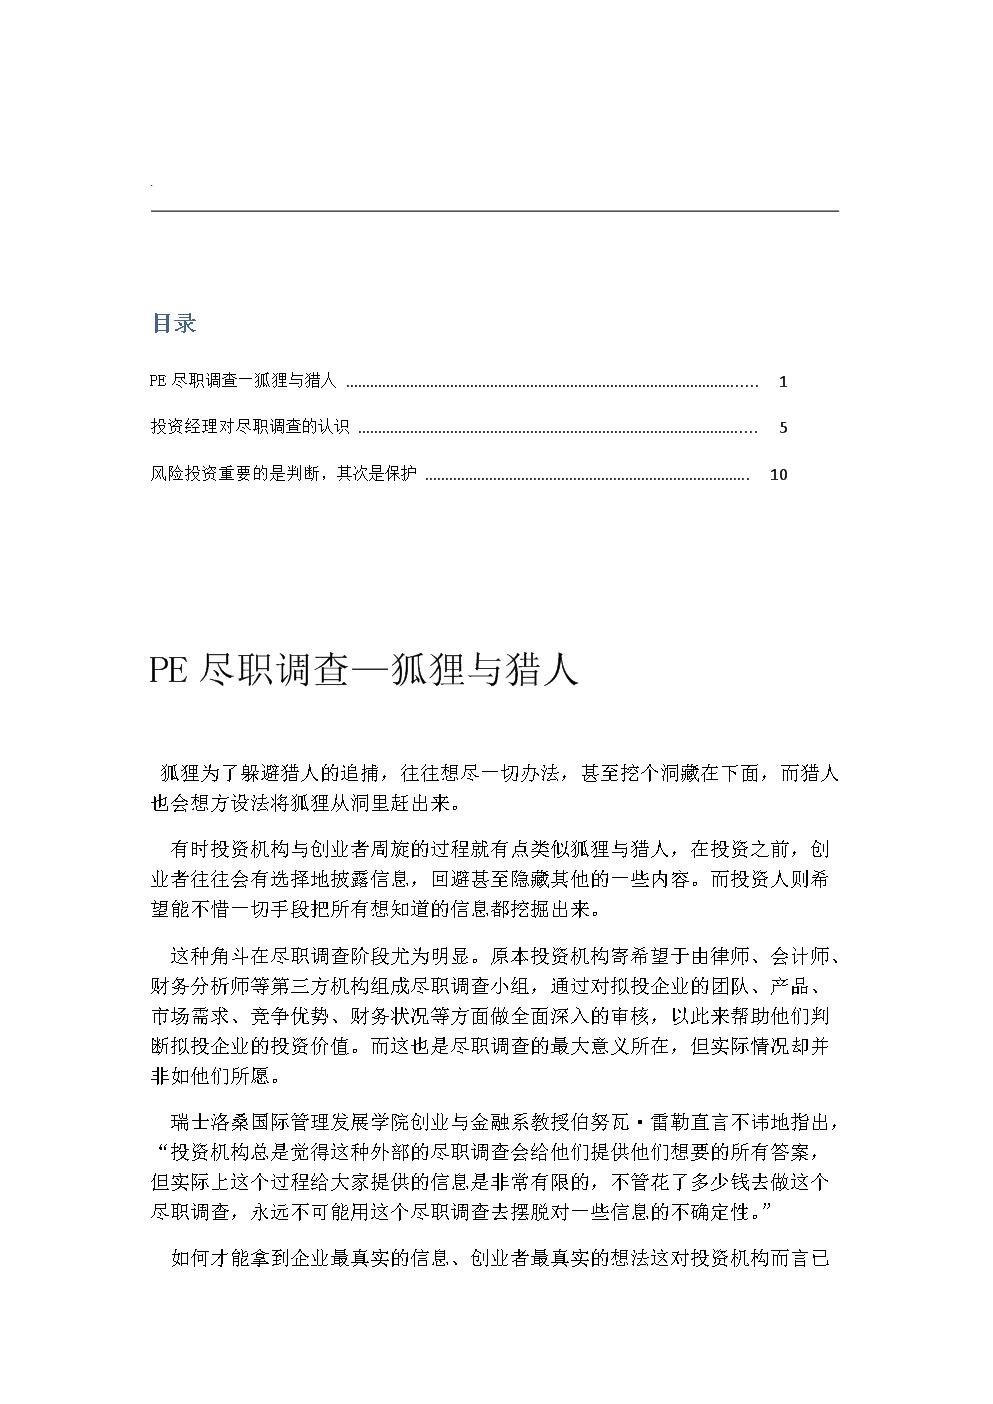 PE尽职调查投资经理讨论.doc